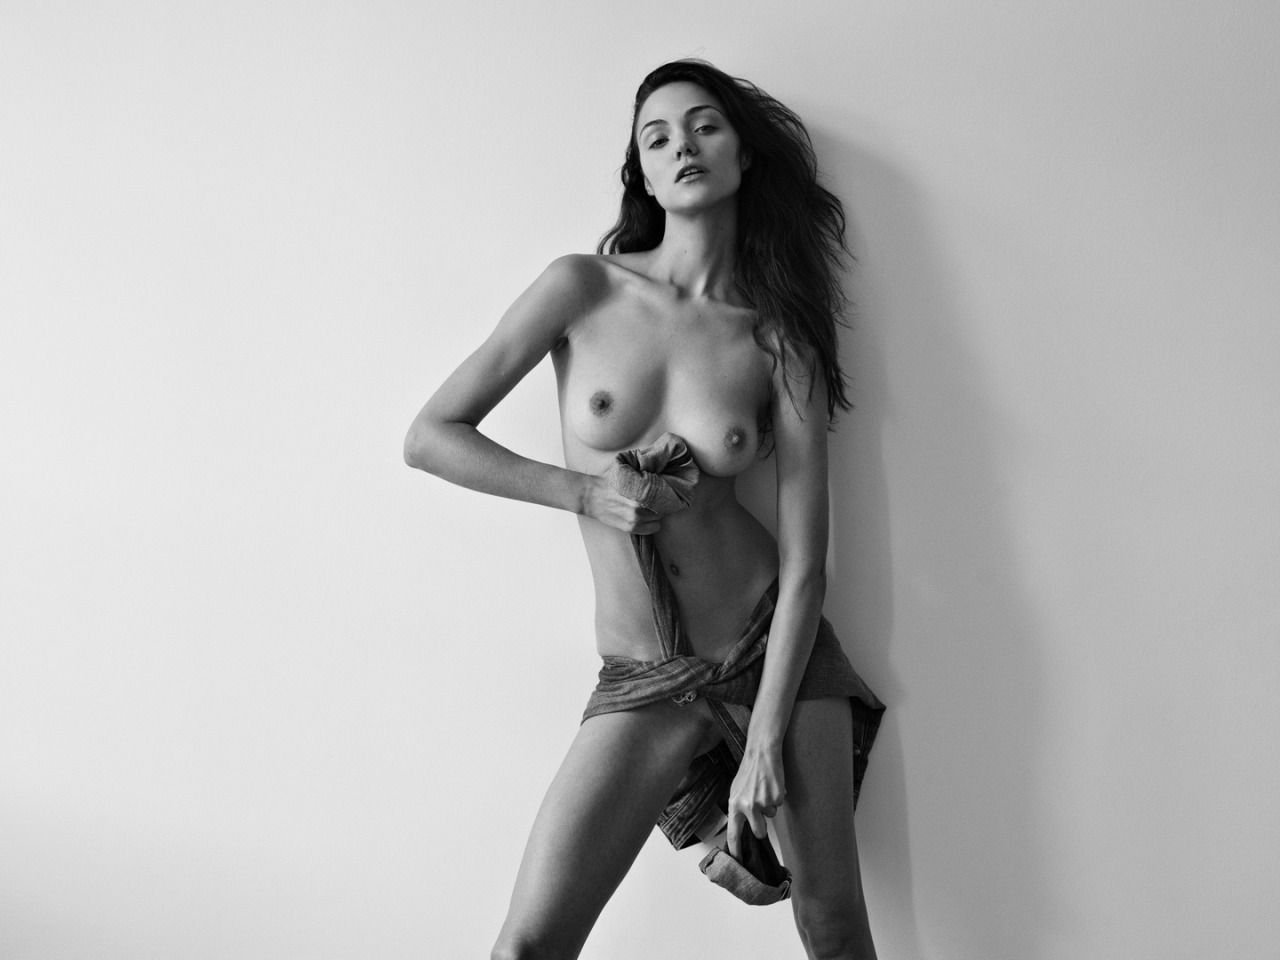 nude judith black